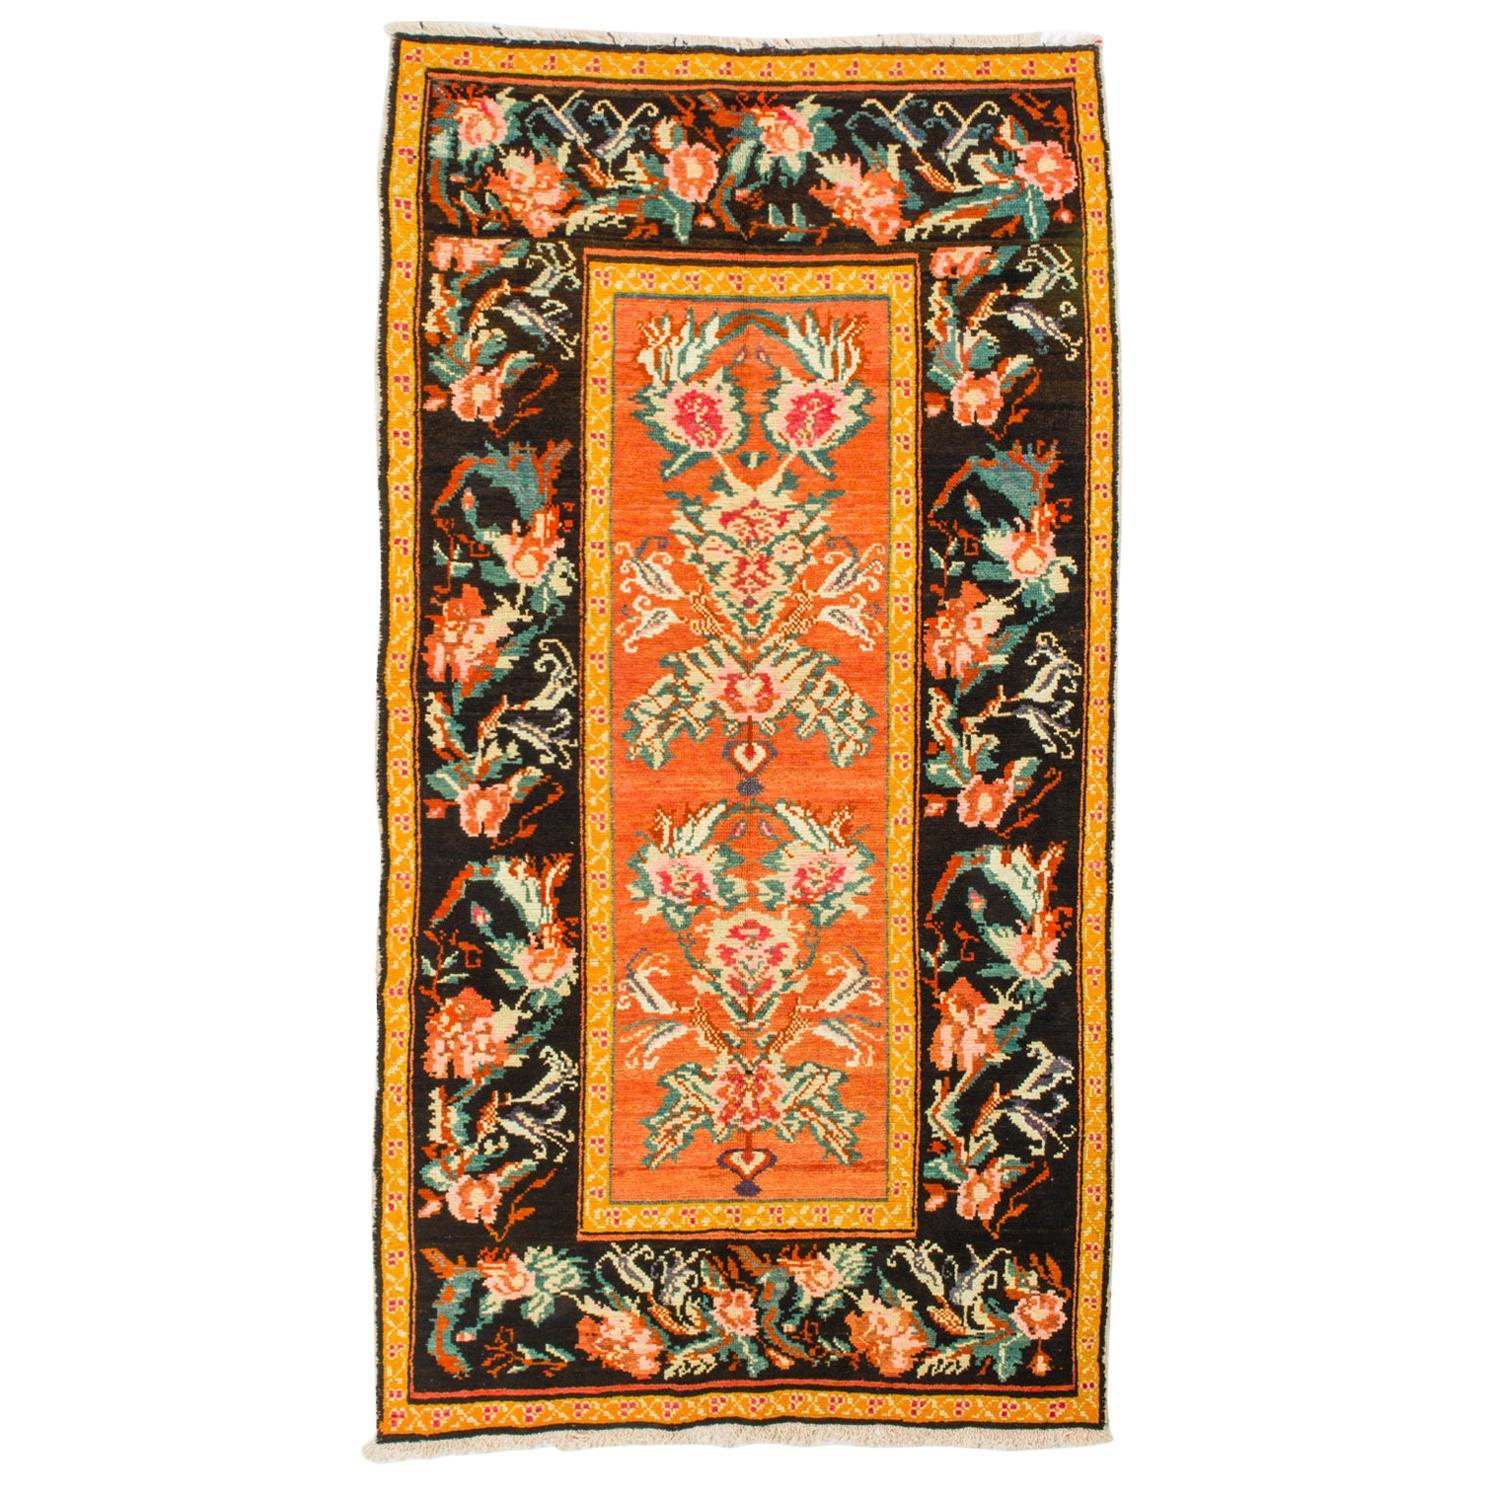 Caucasian Vintage Carpet with a Good Price